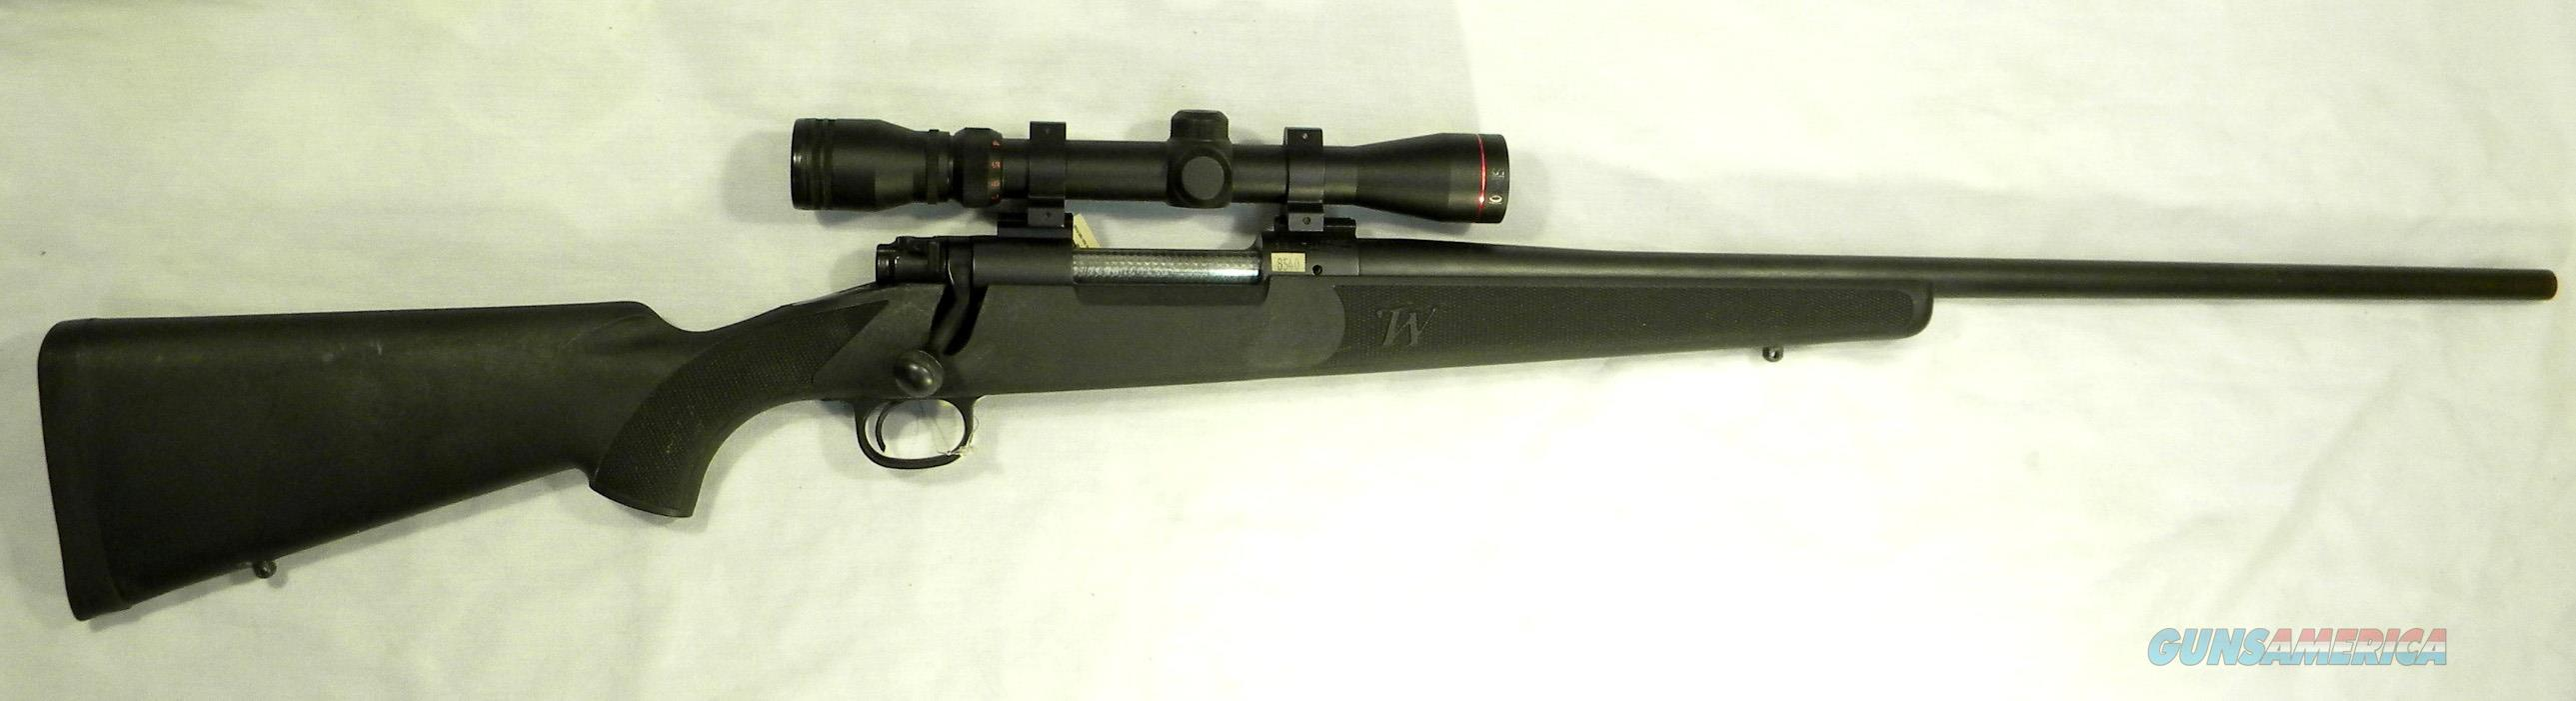 Winchester Model 70, .30-06 Bolt-Action Rifle, Adjustable Trigger, Factory Composite Stock  Guns > Rifles > Winchester Rifles - Modern Bolt/Auto/Single > Model 70 > Post-64